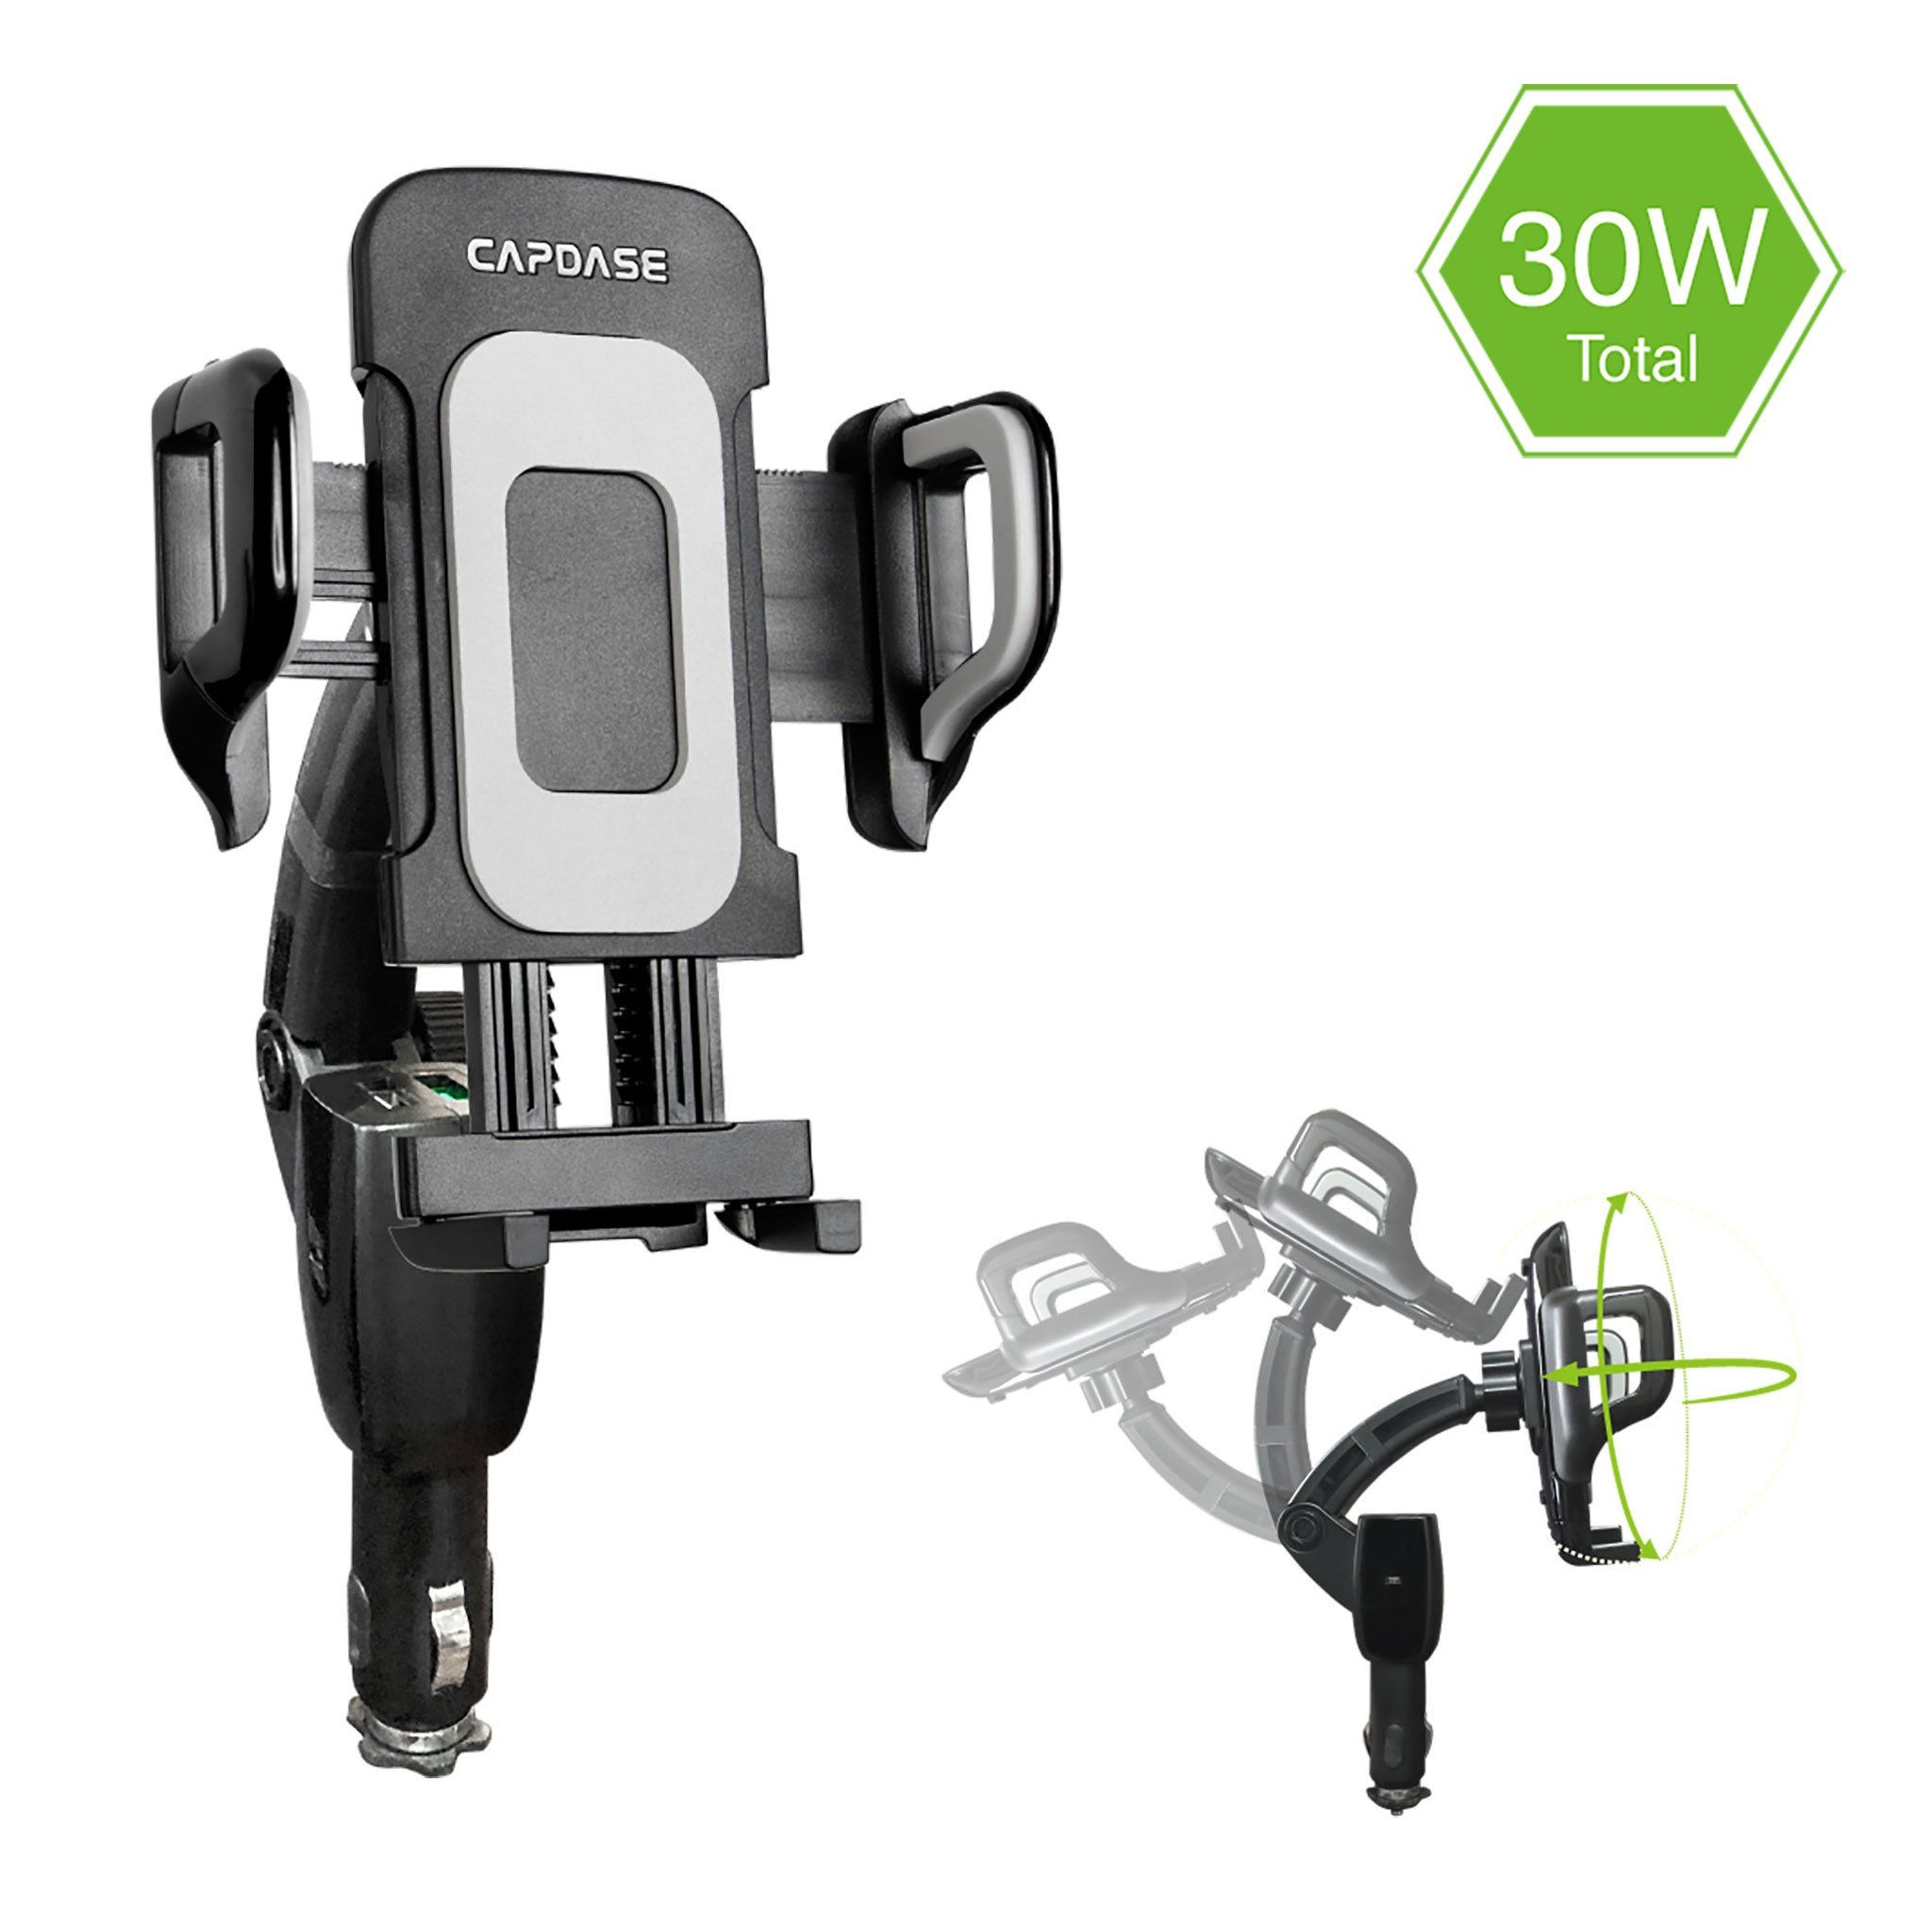 FLEXICHARGING ARM F30 QC 3.0 Car Charger Mount Iphone